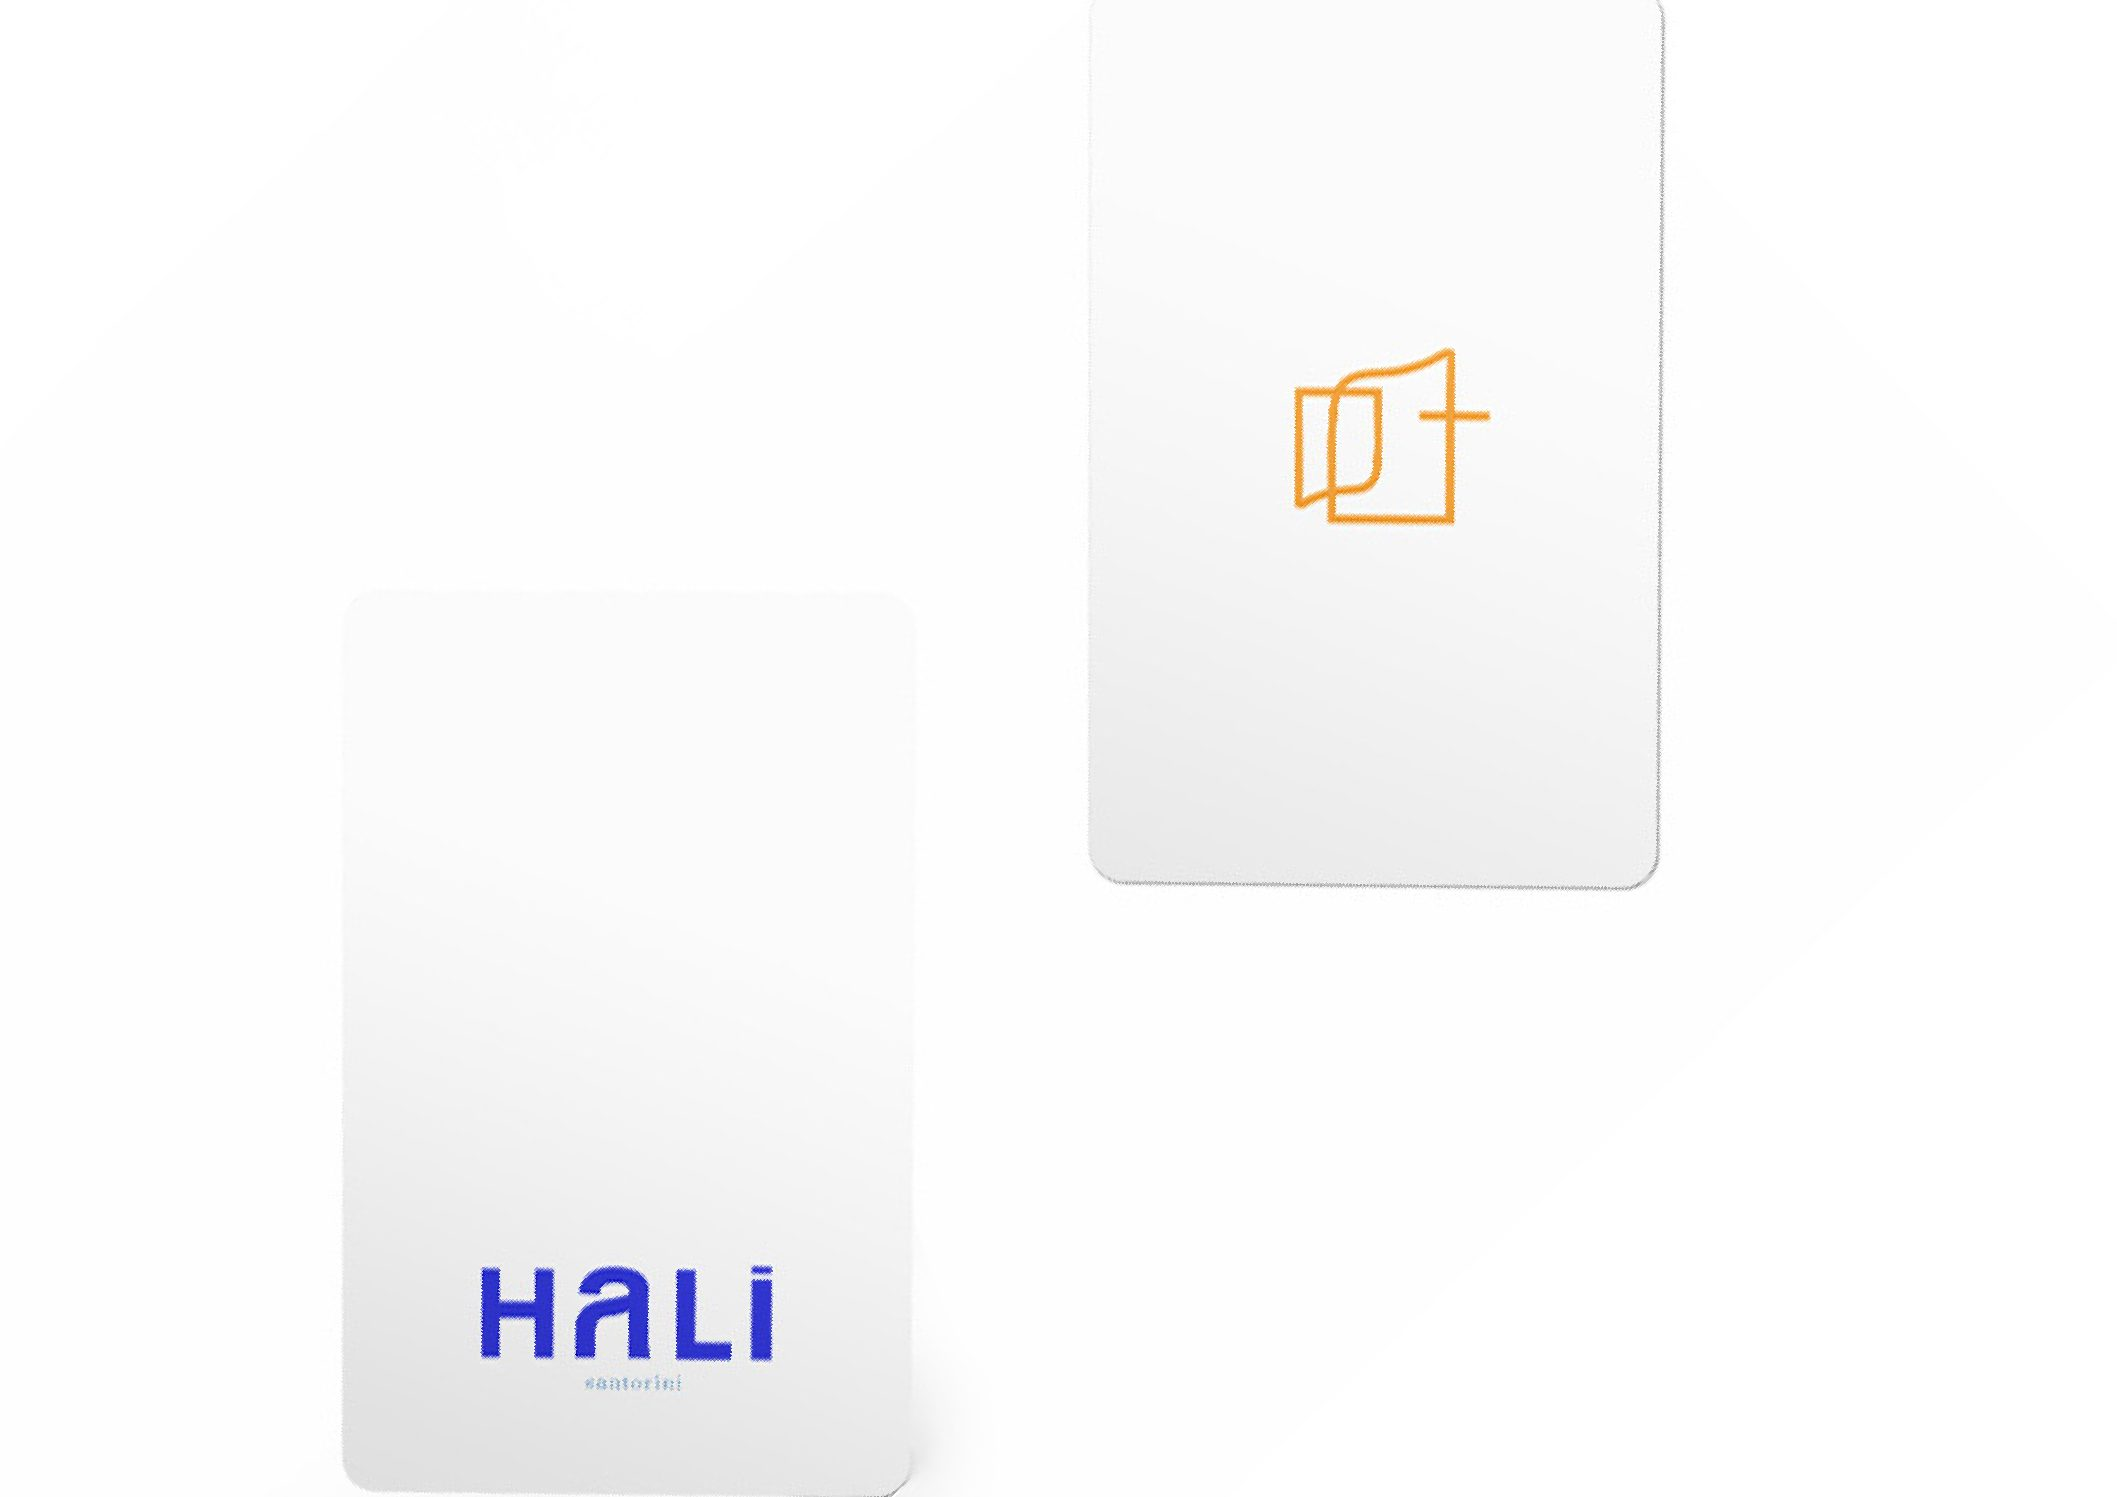 hali21